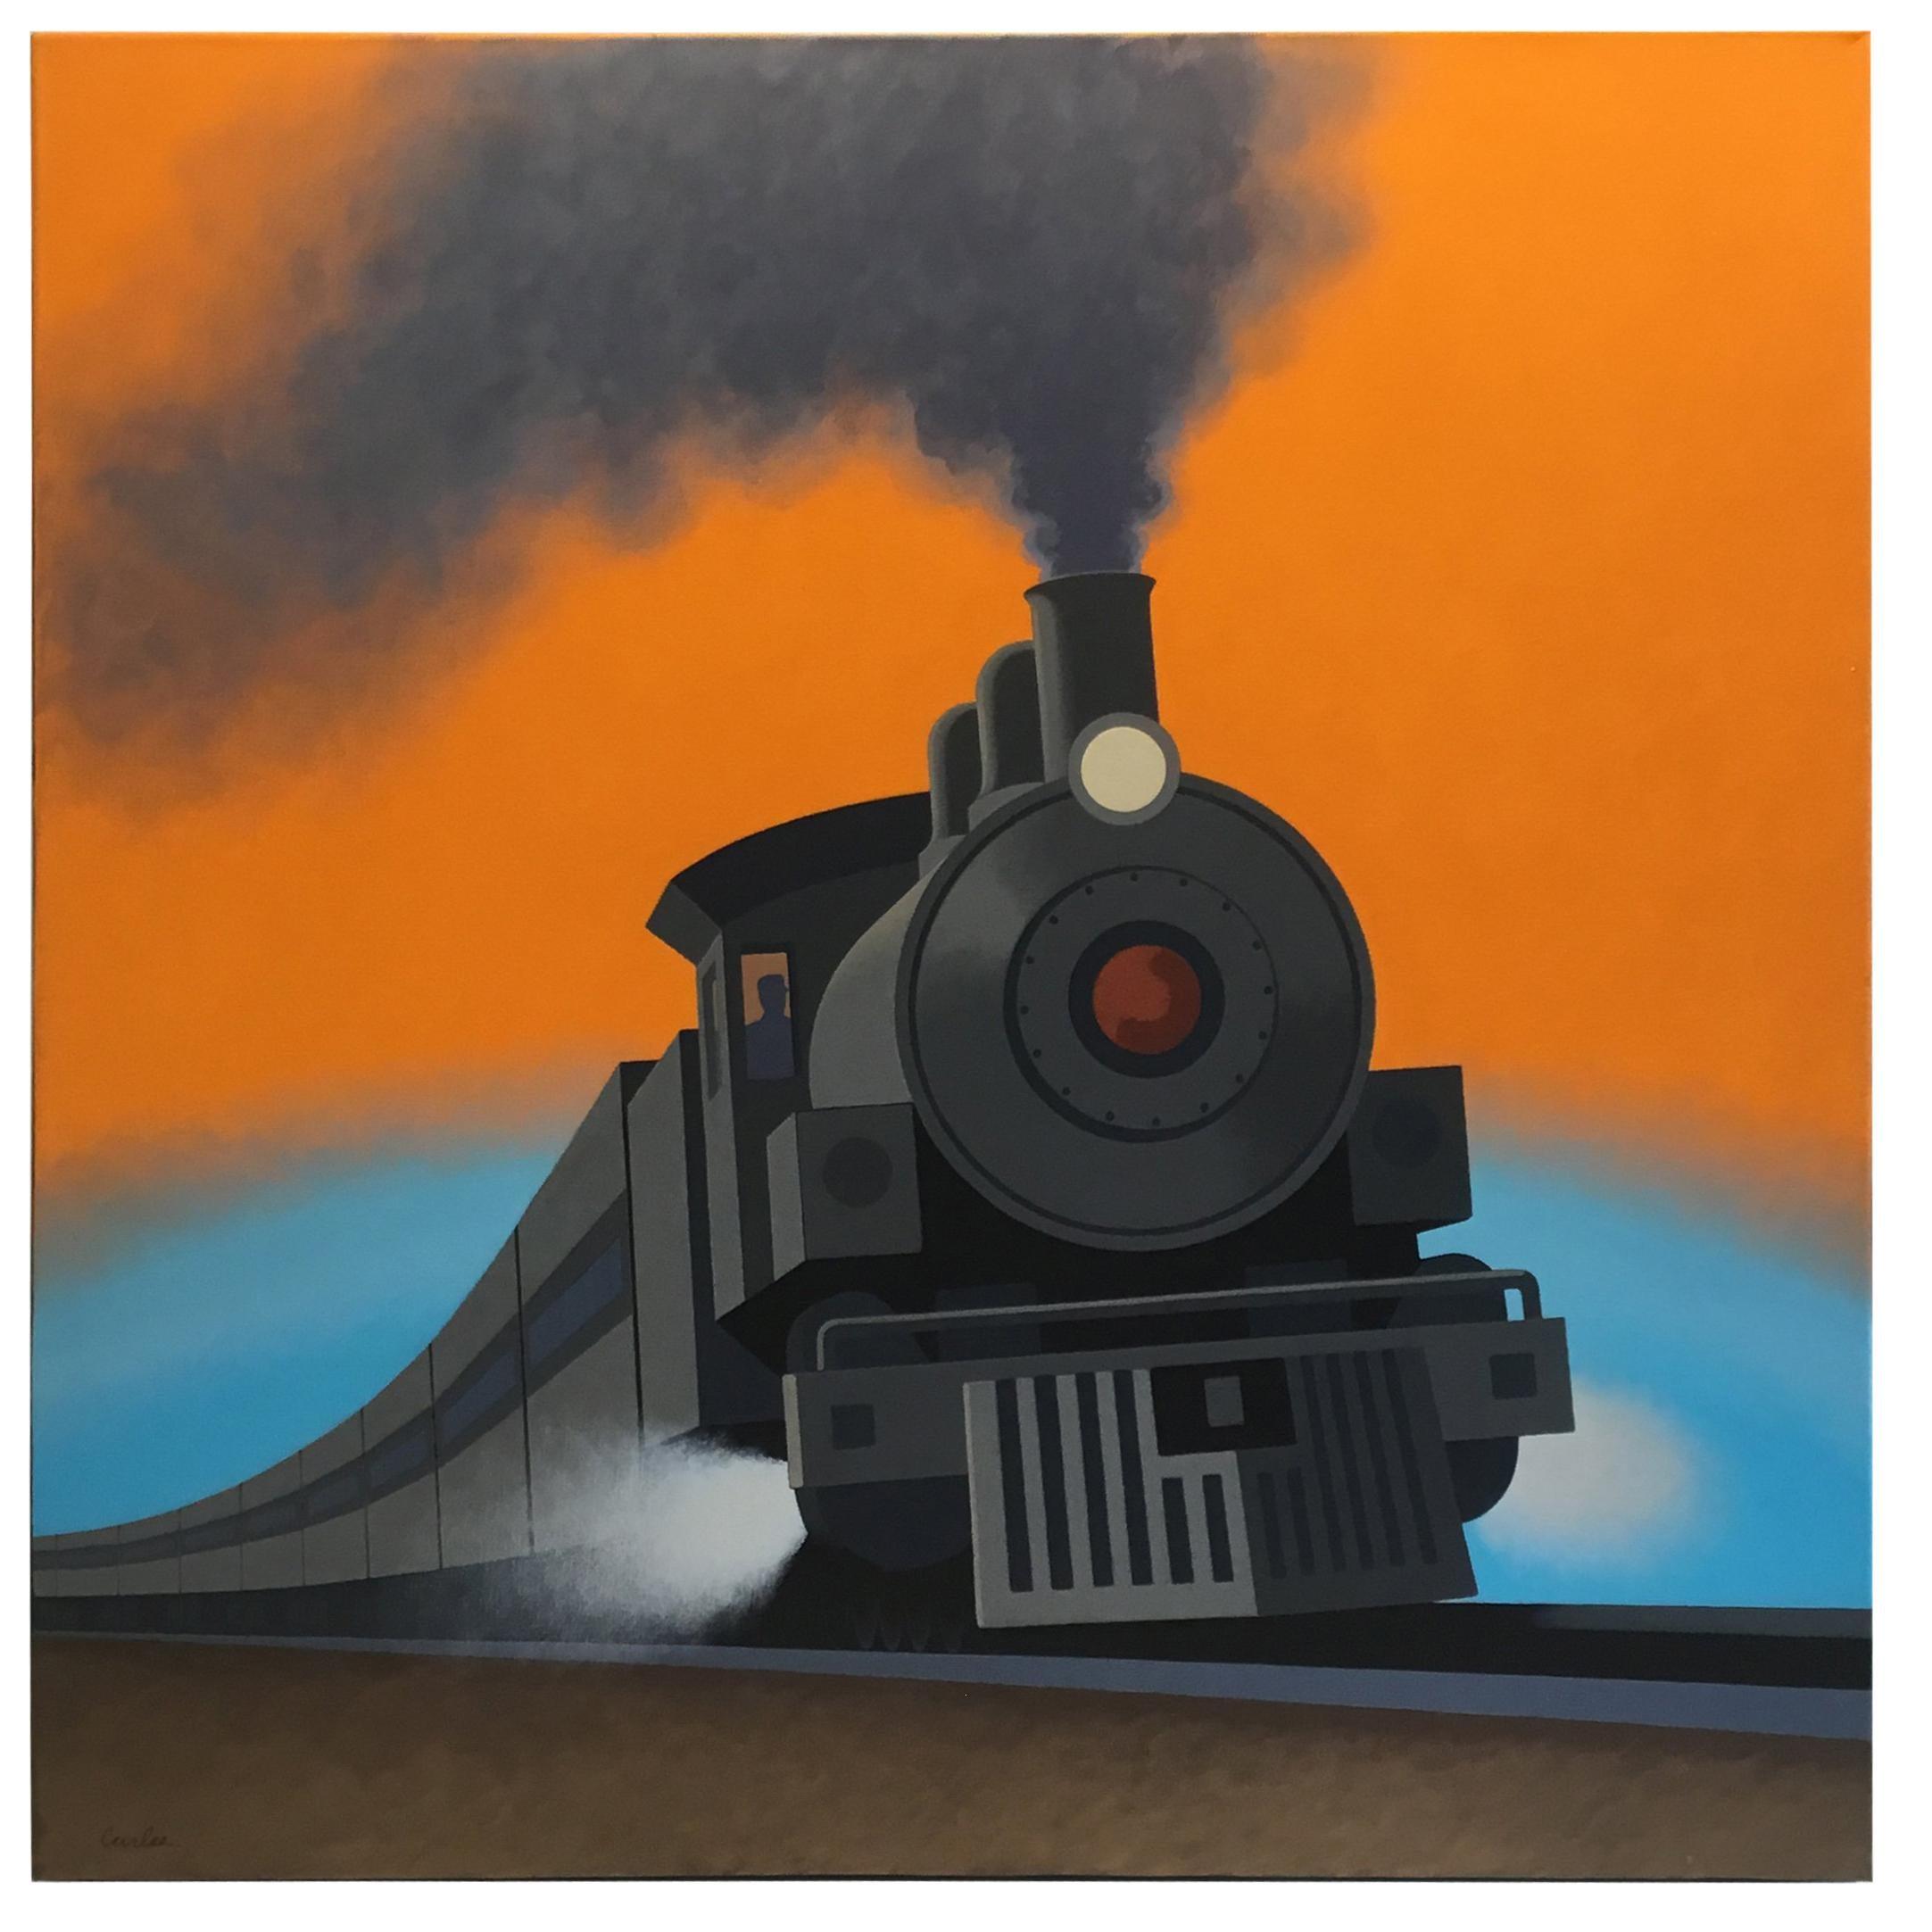 Locomotive, Original Painting by Lynn Curlee